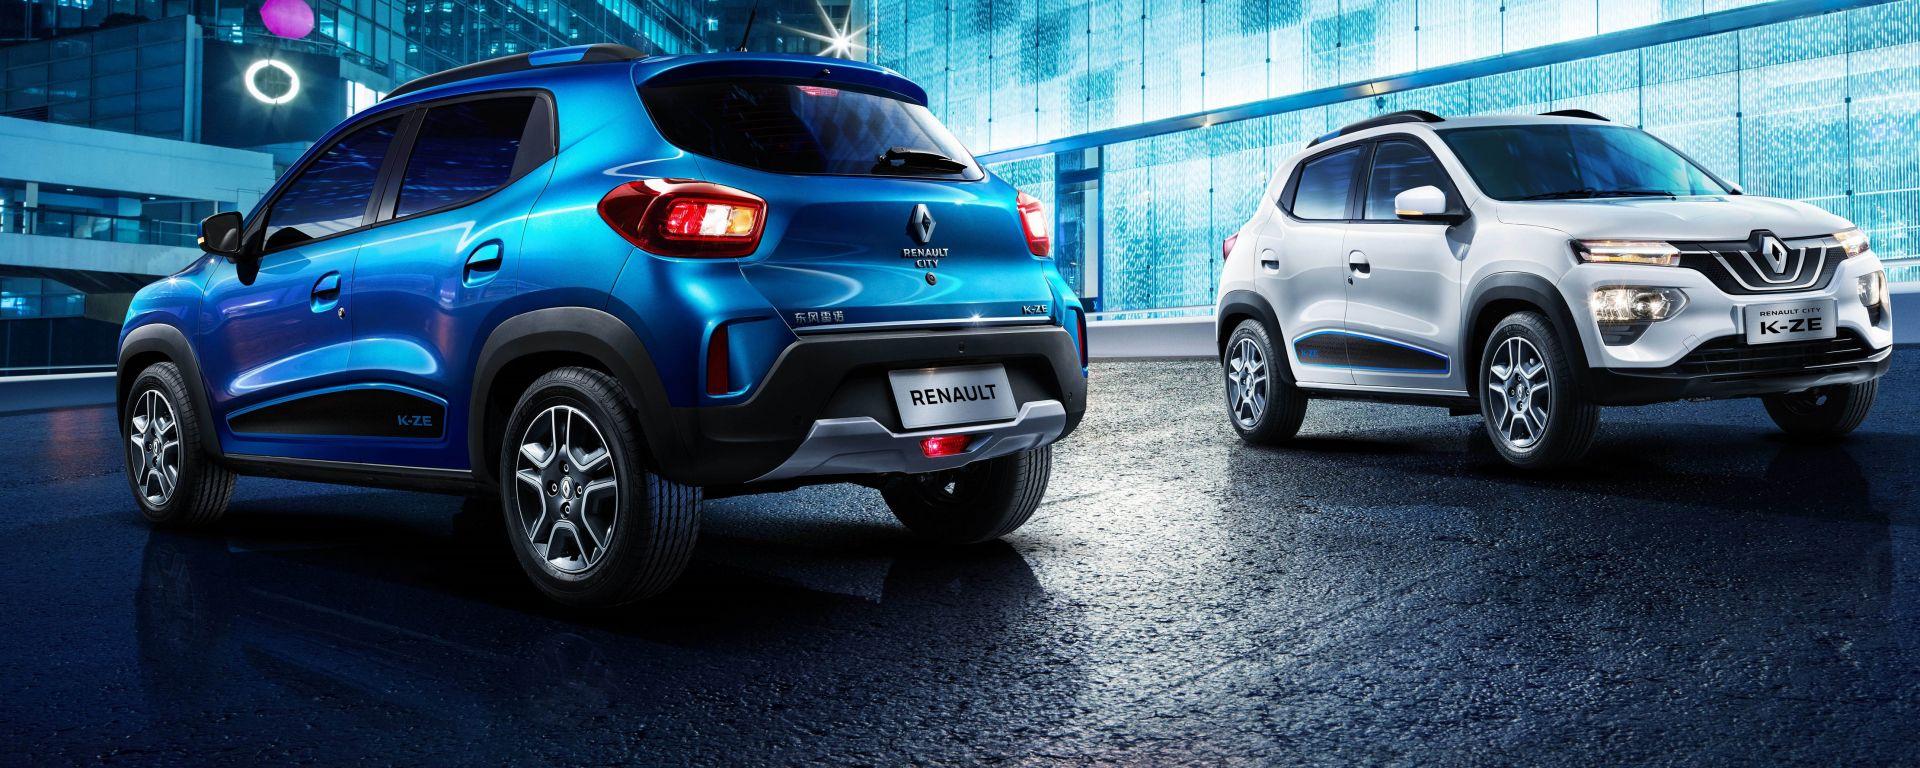 SUV elettrico Dacia: sarà su base Renault City K-ZE?